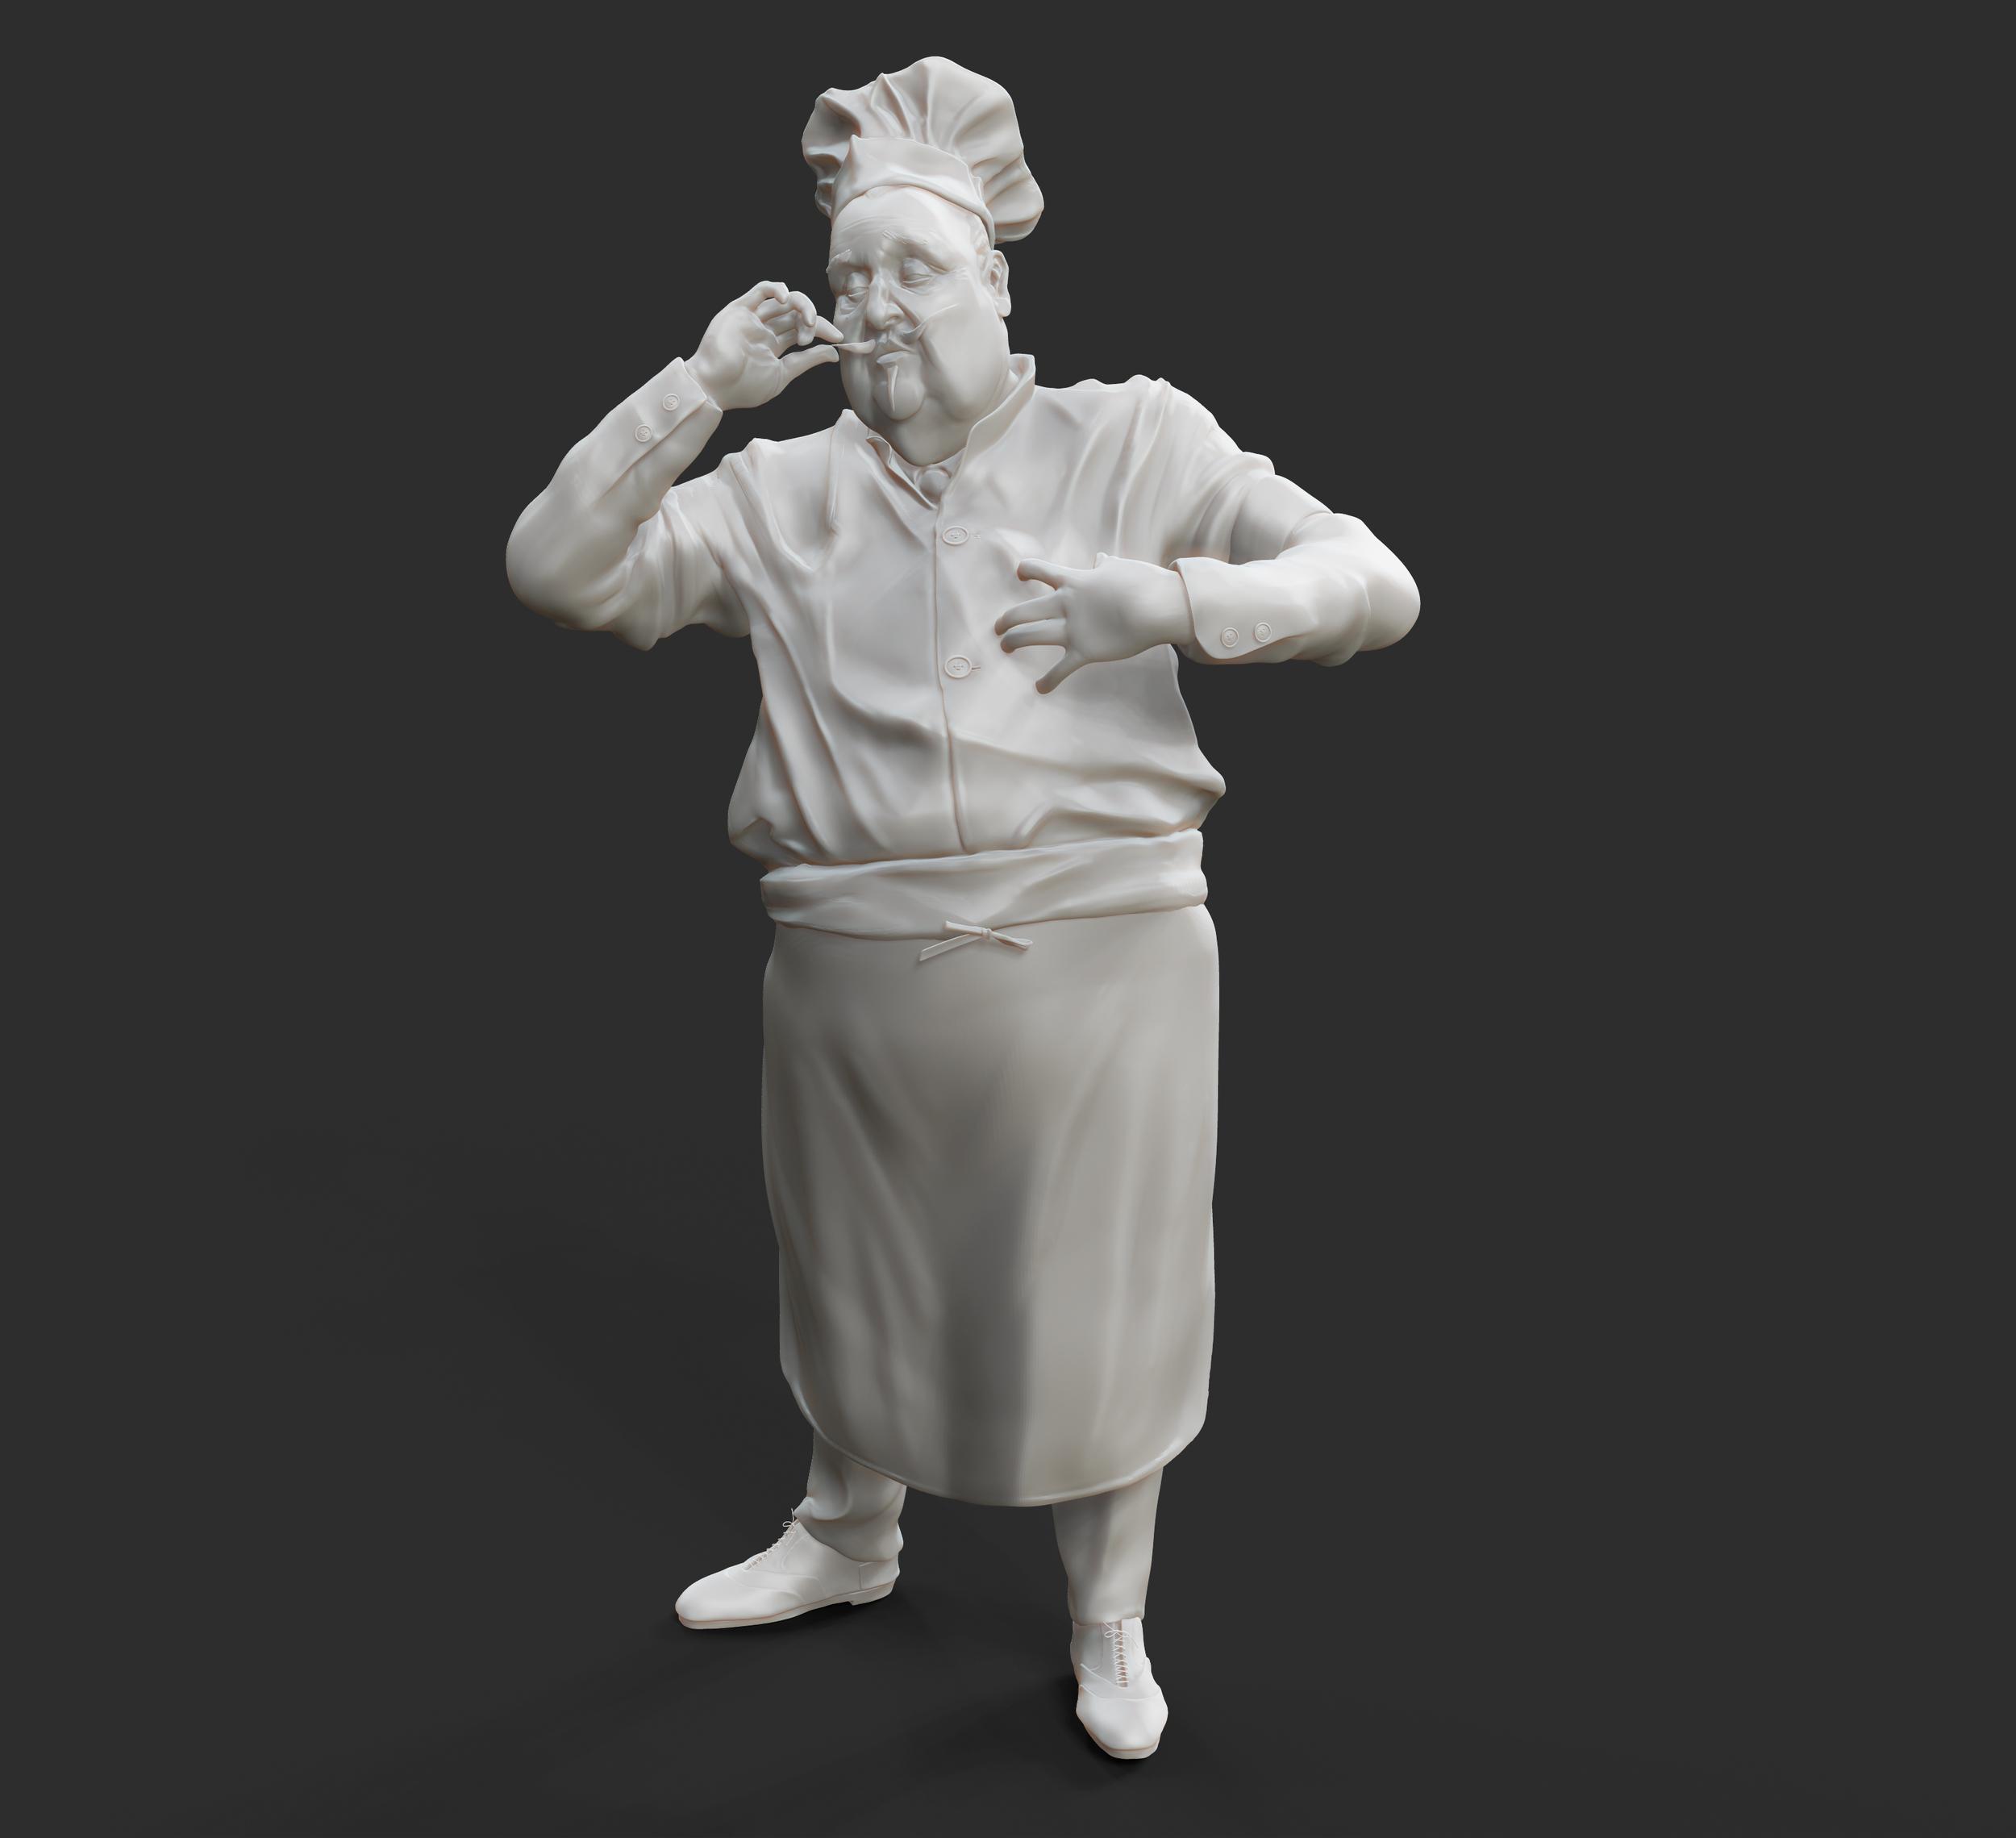 J.C Leyendecker: Chef Model